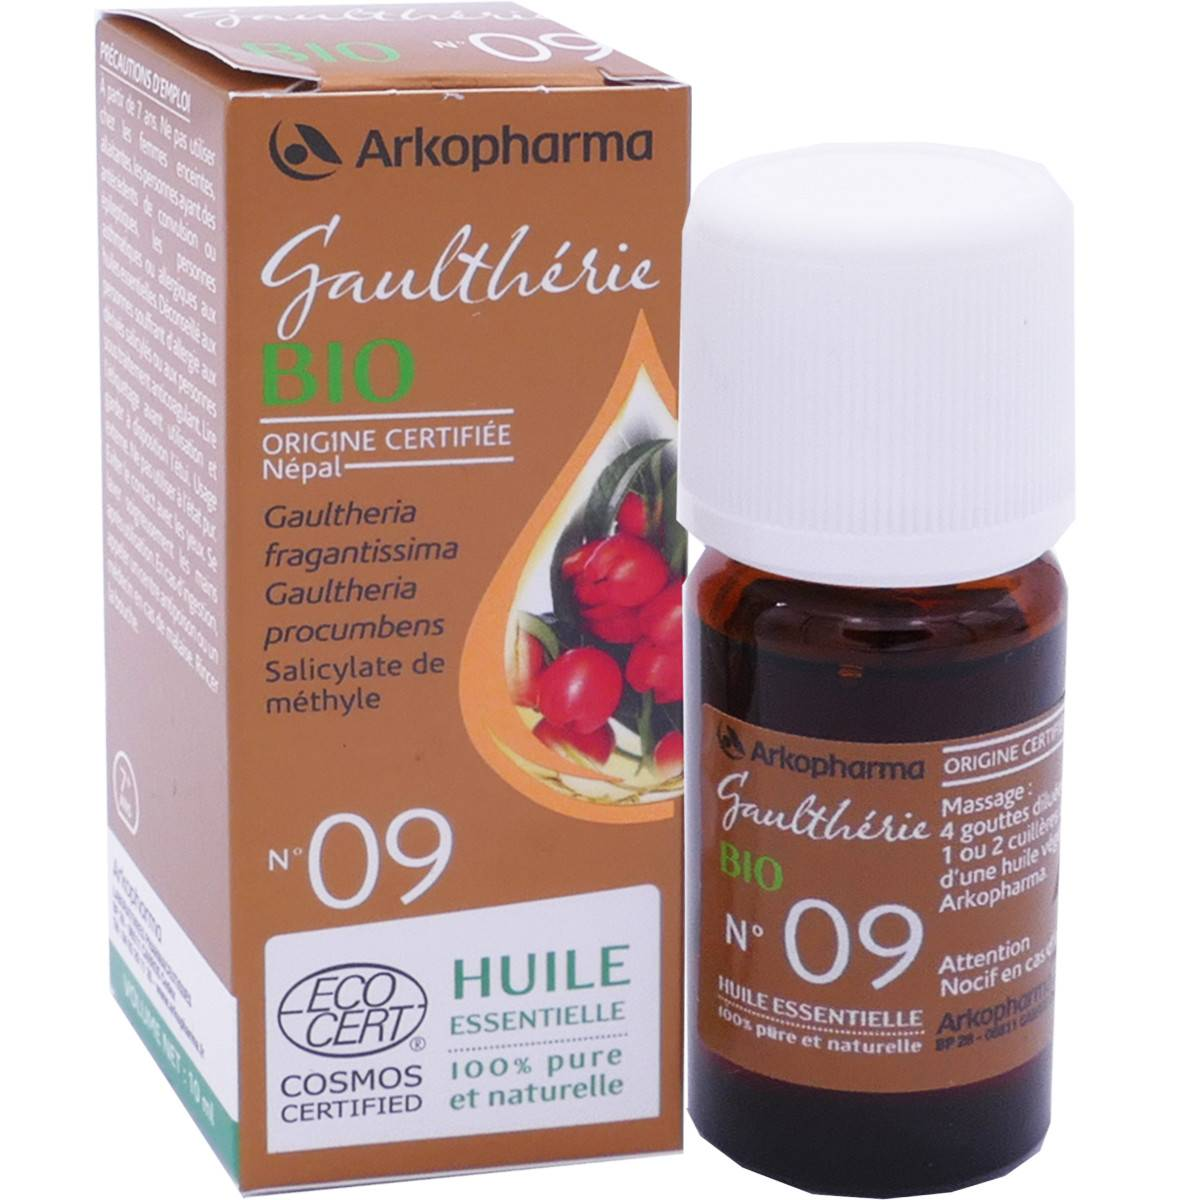 Arkopharma huile essentielle gaultherie bio n°09 10ml